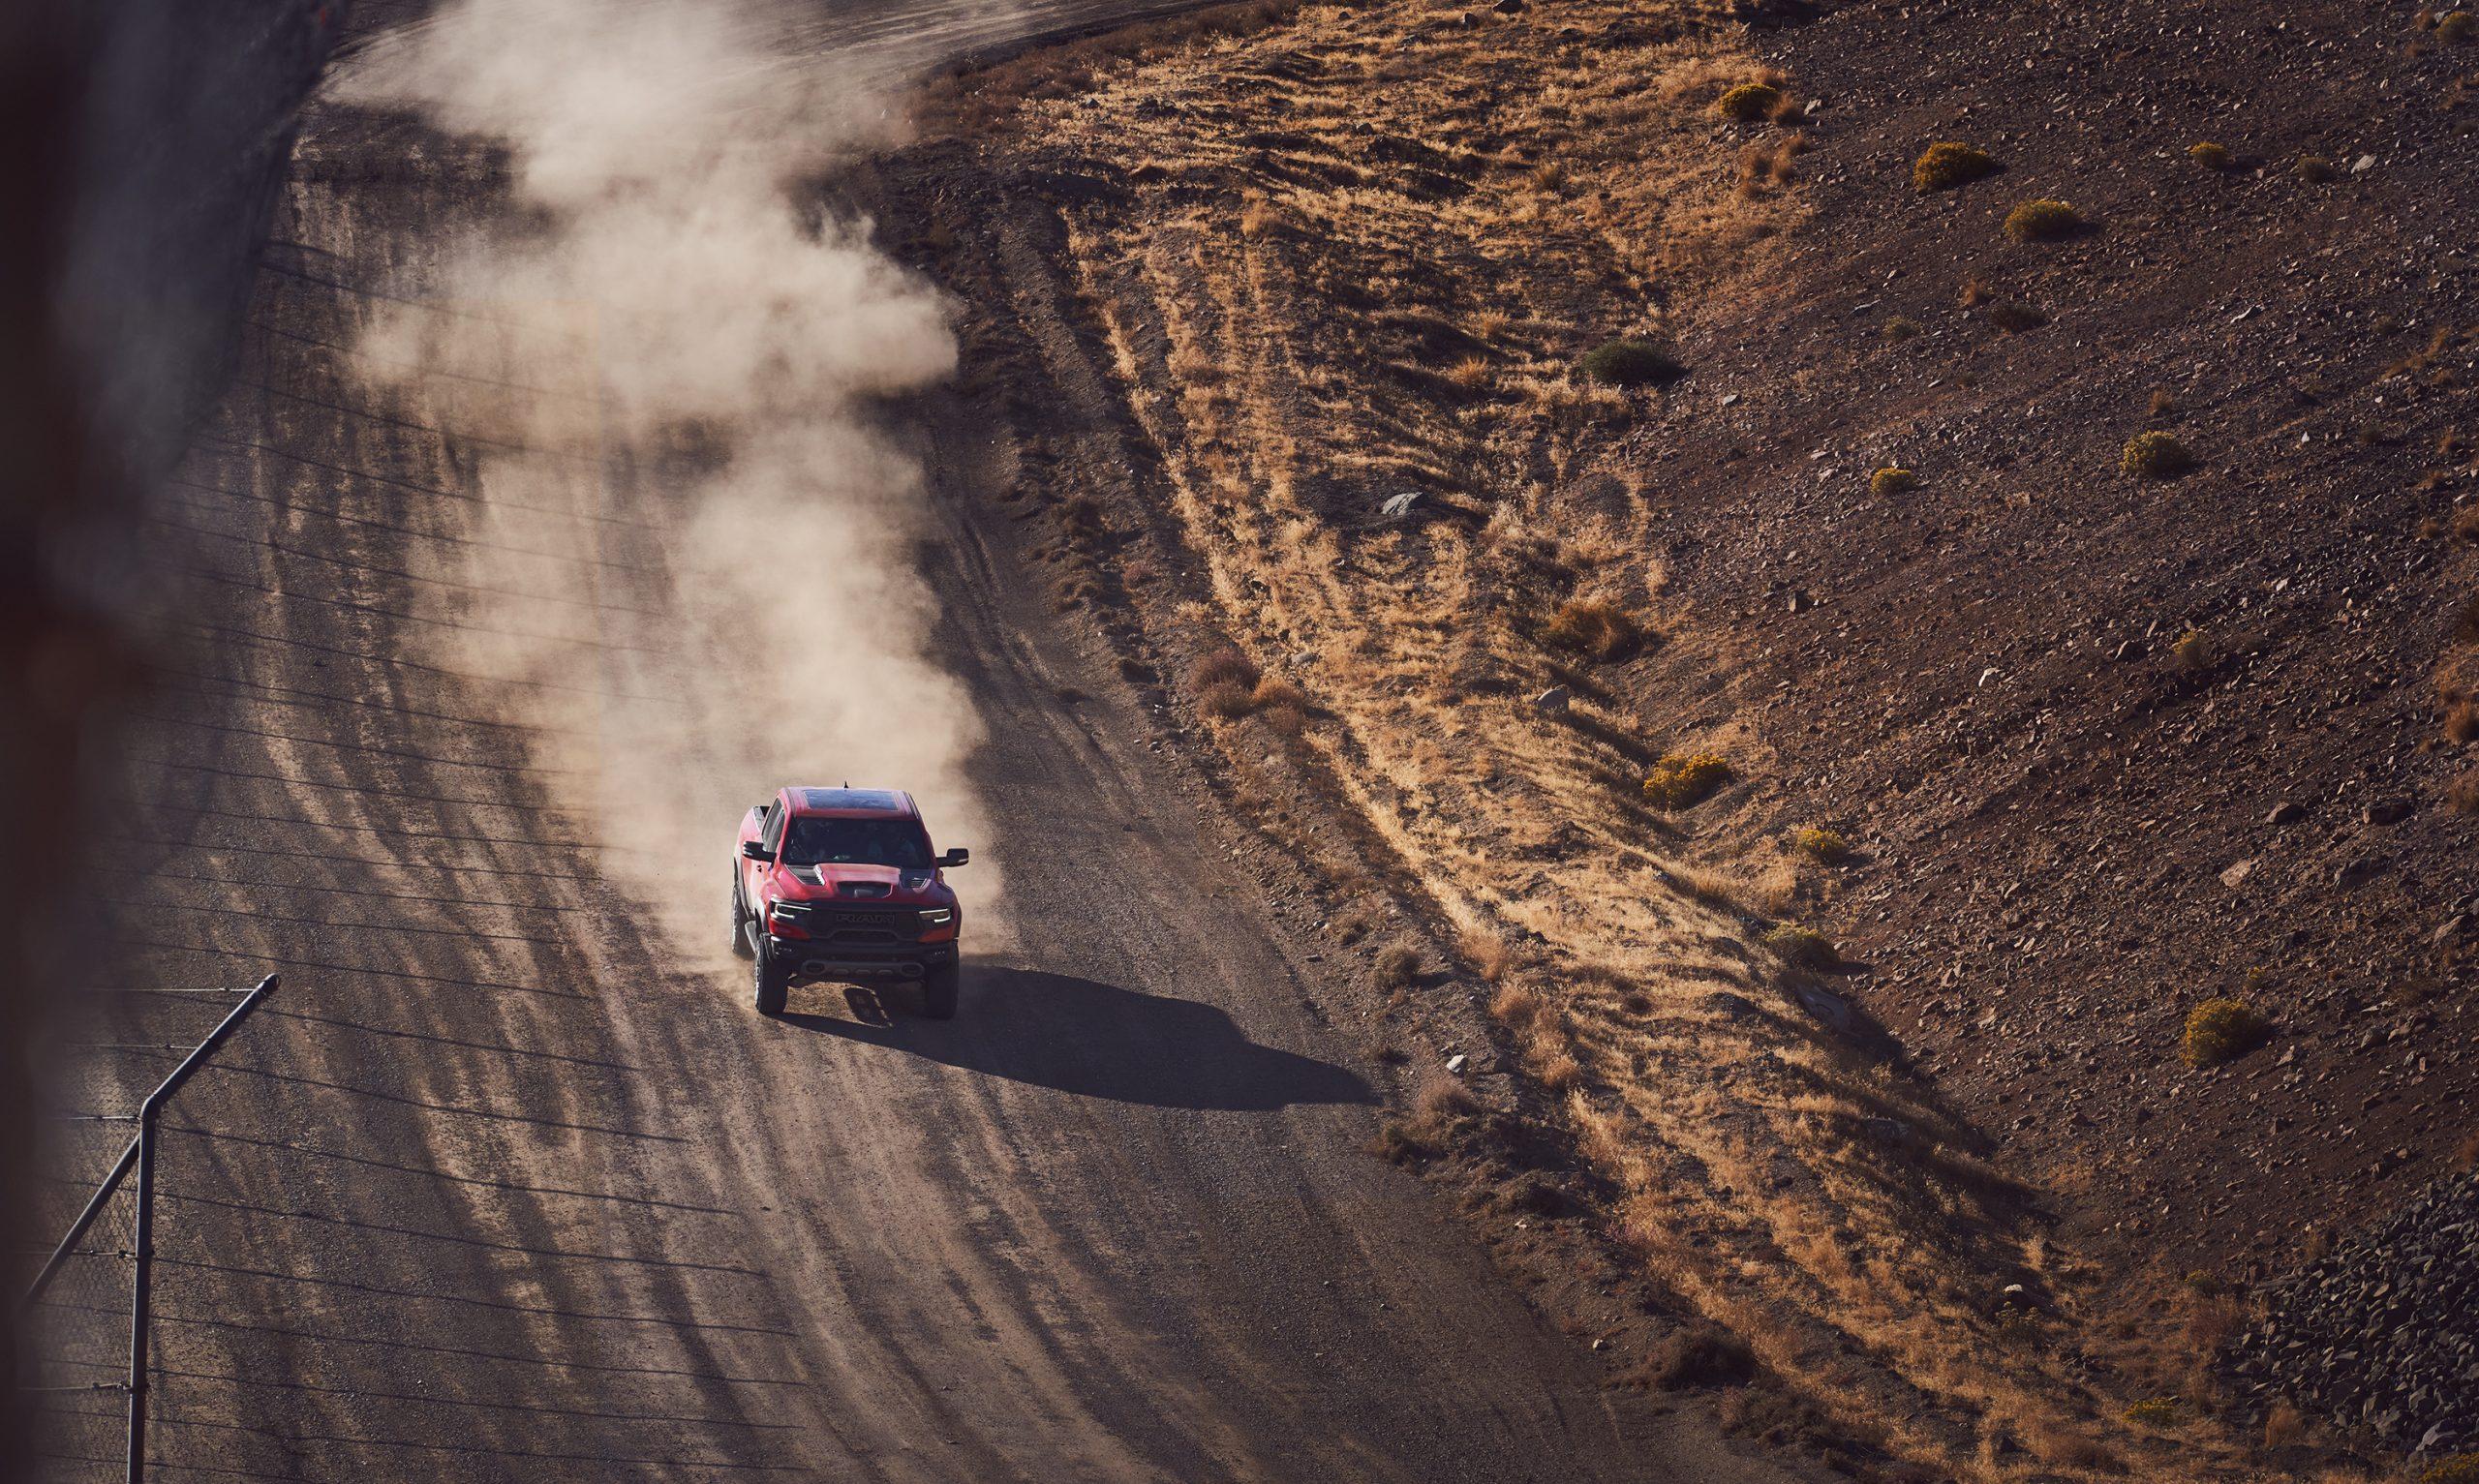 2021 Ram 1500 TRX dirt track dynamic action overhead